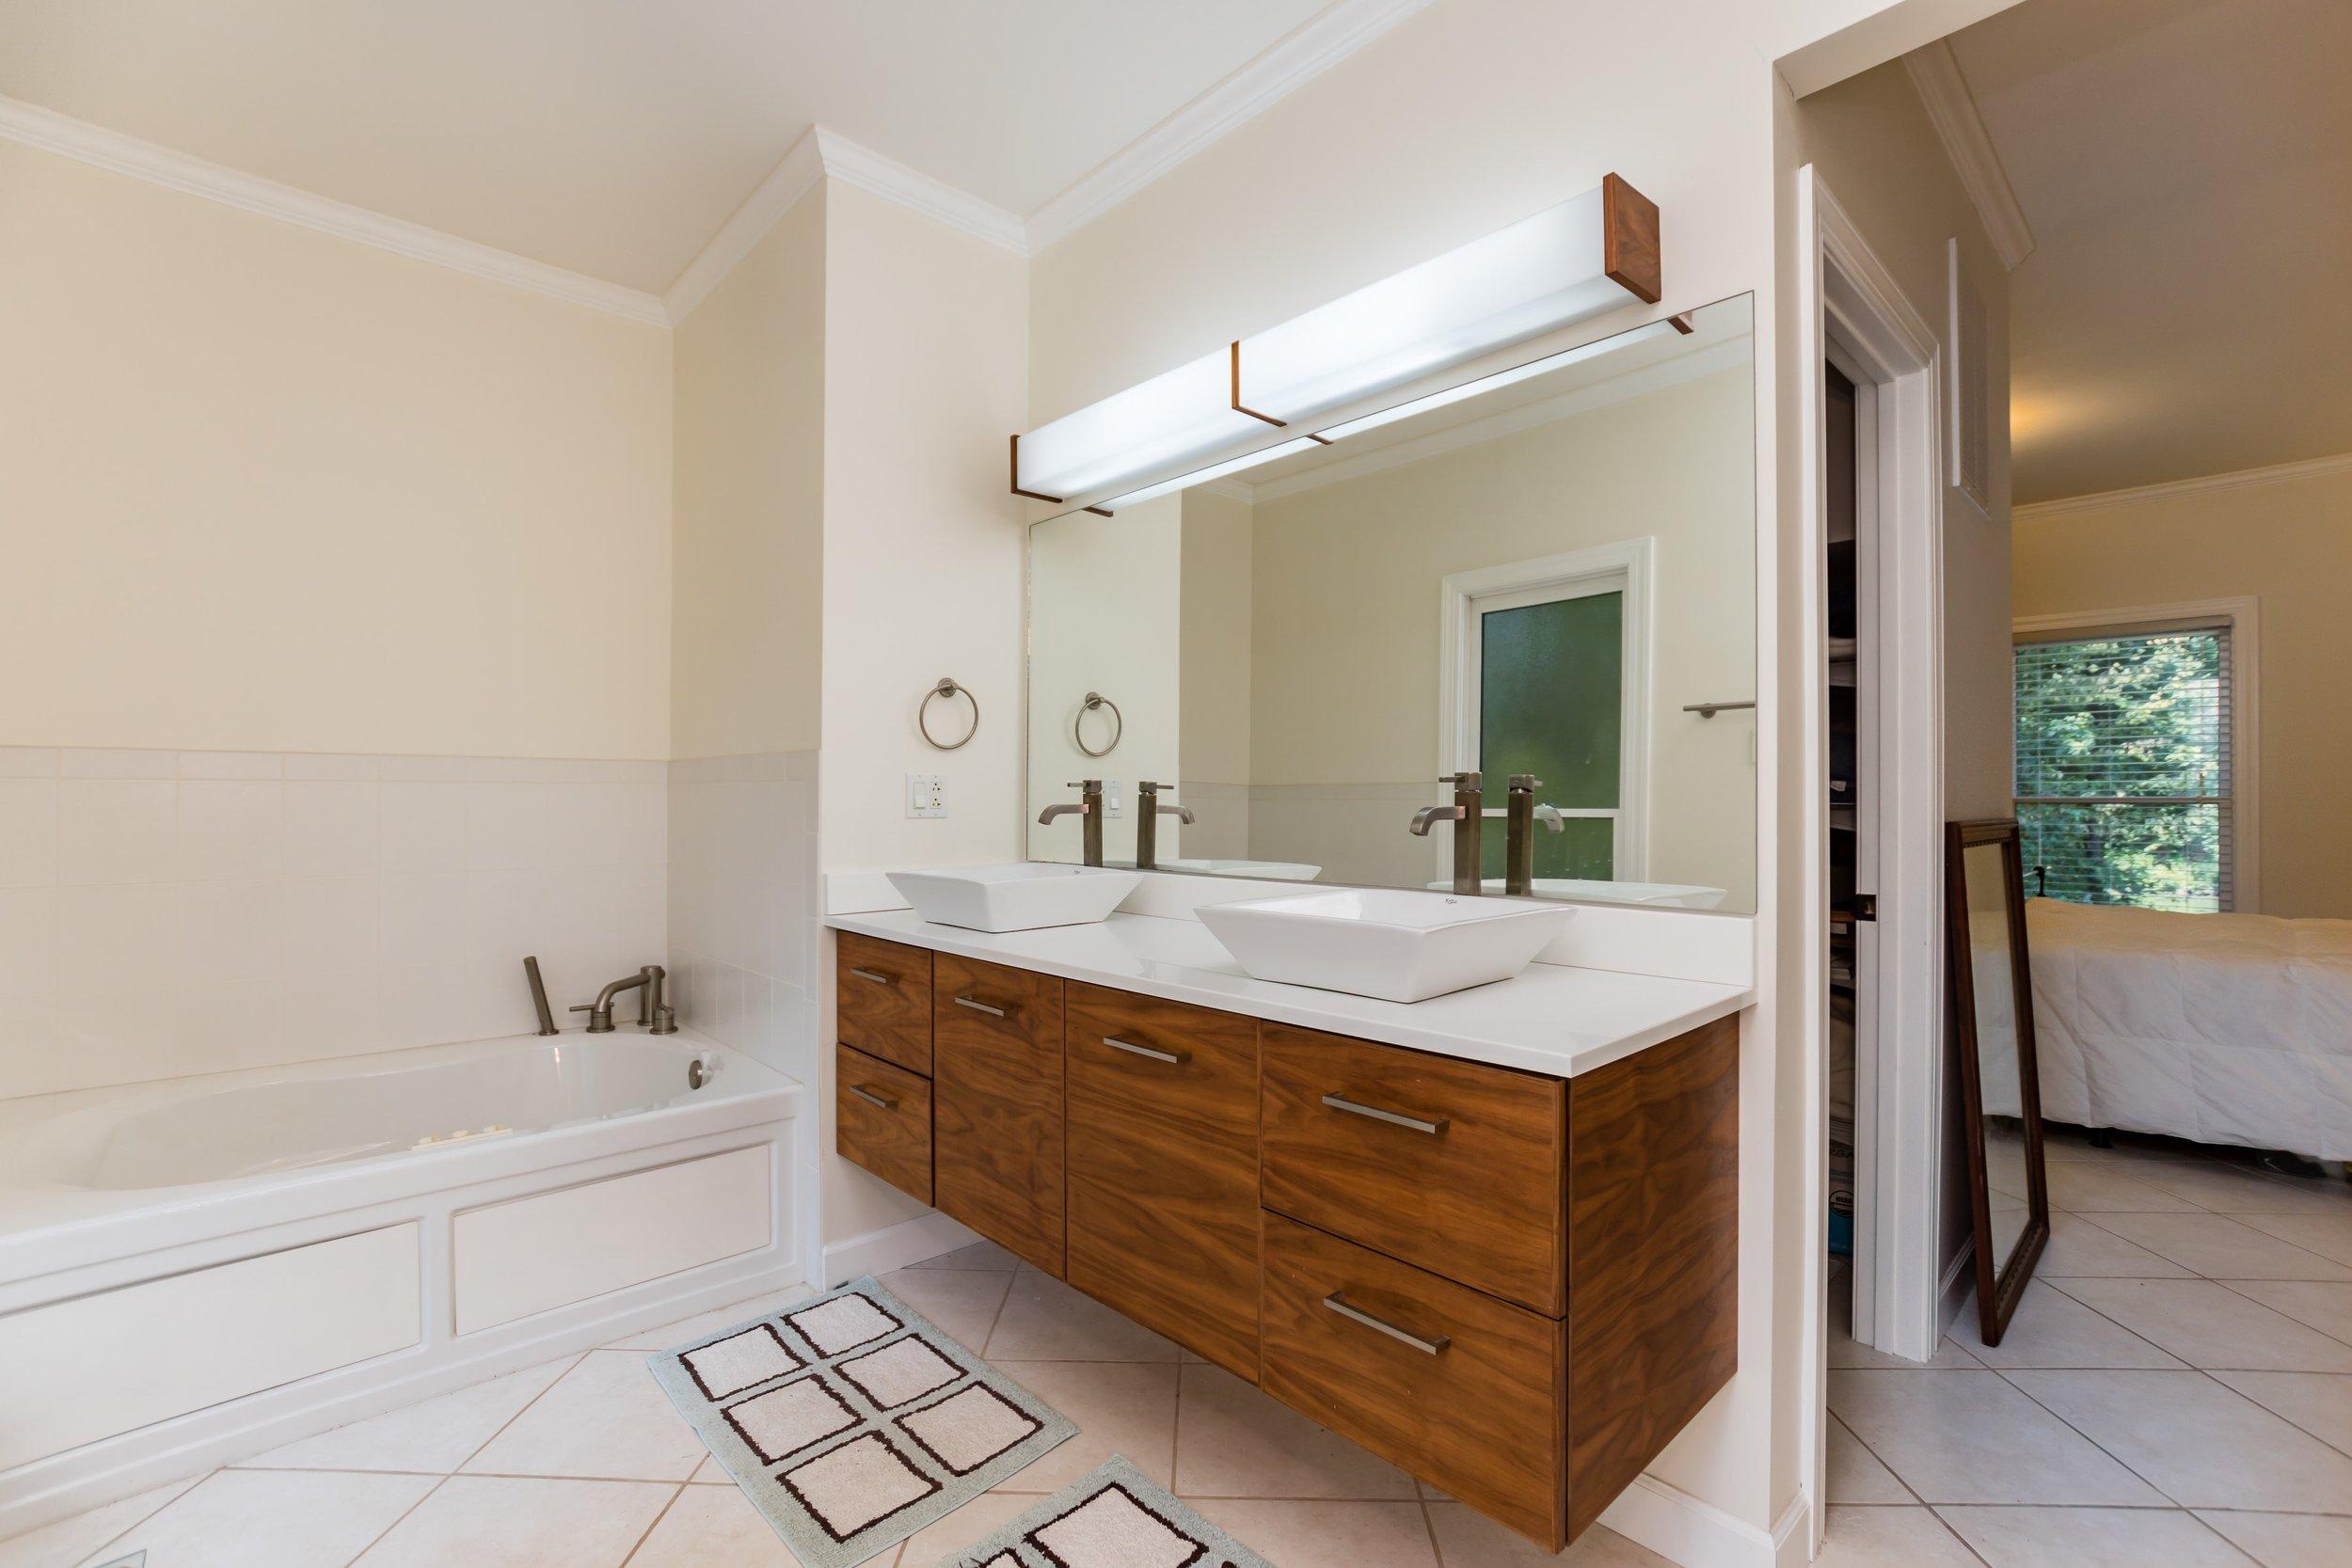 015_Master Bathroom.jpg